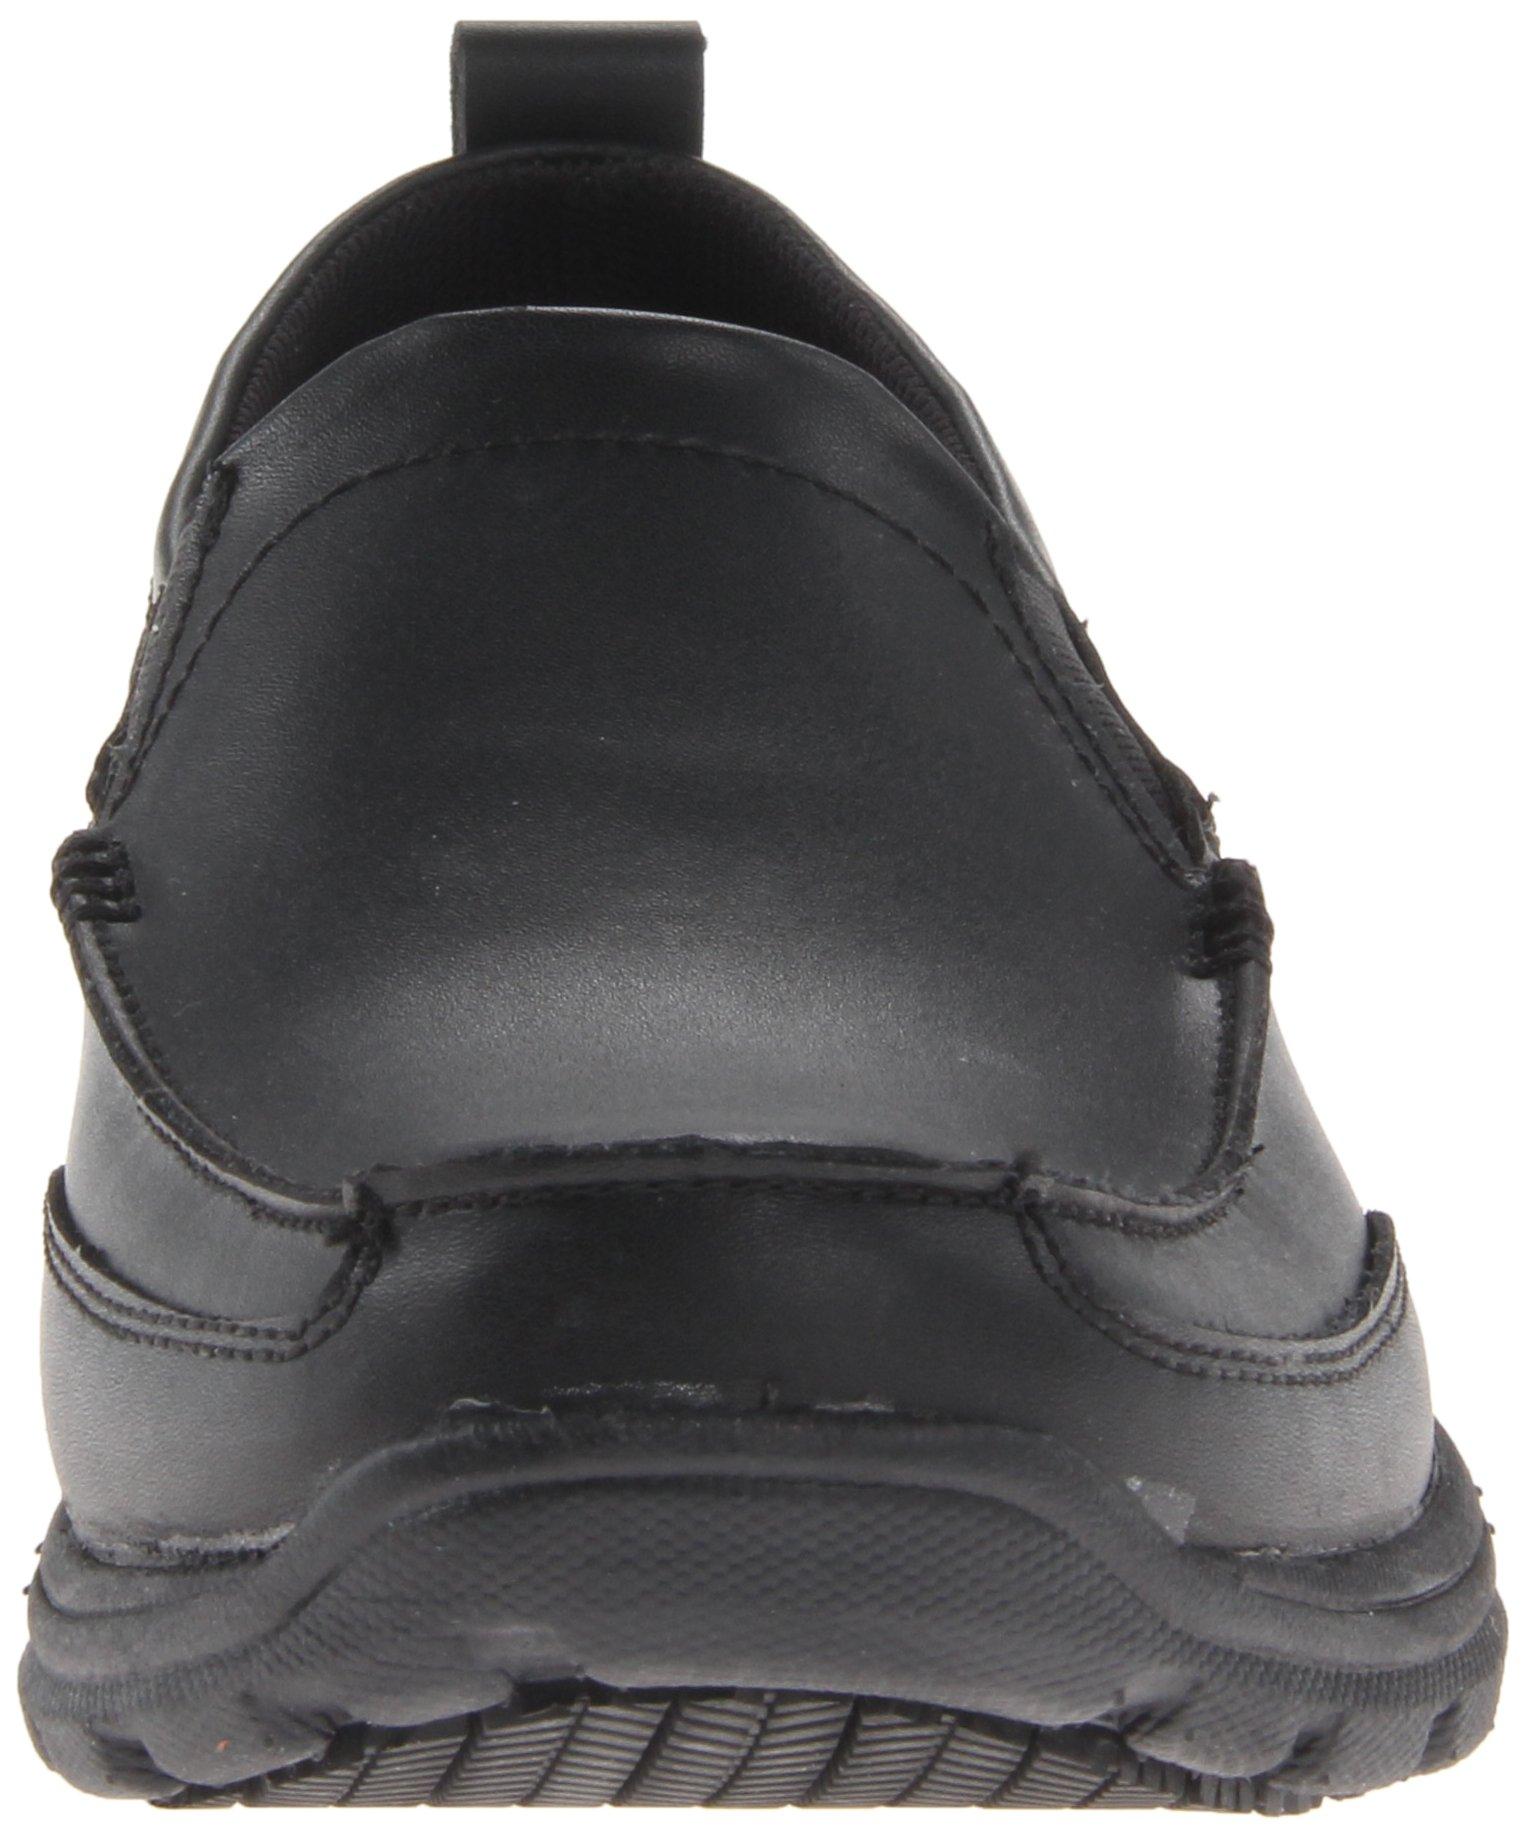 Skechers for Work Men's Hobbes Relaxed Fit Slip Resistant Work Shoe, Black, 11.5 M US by Skechers (Image #4)